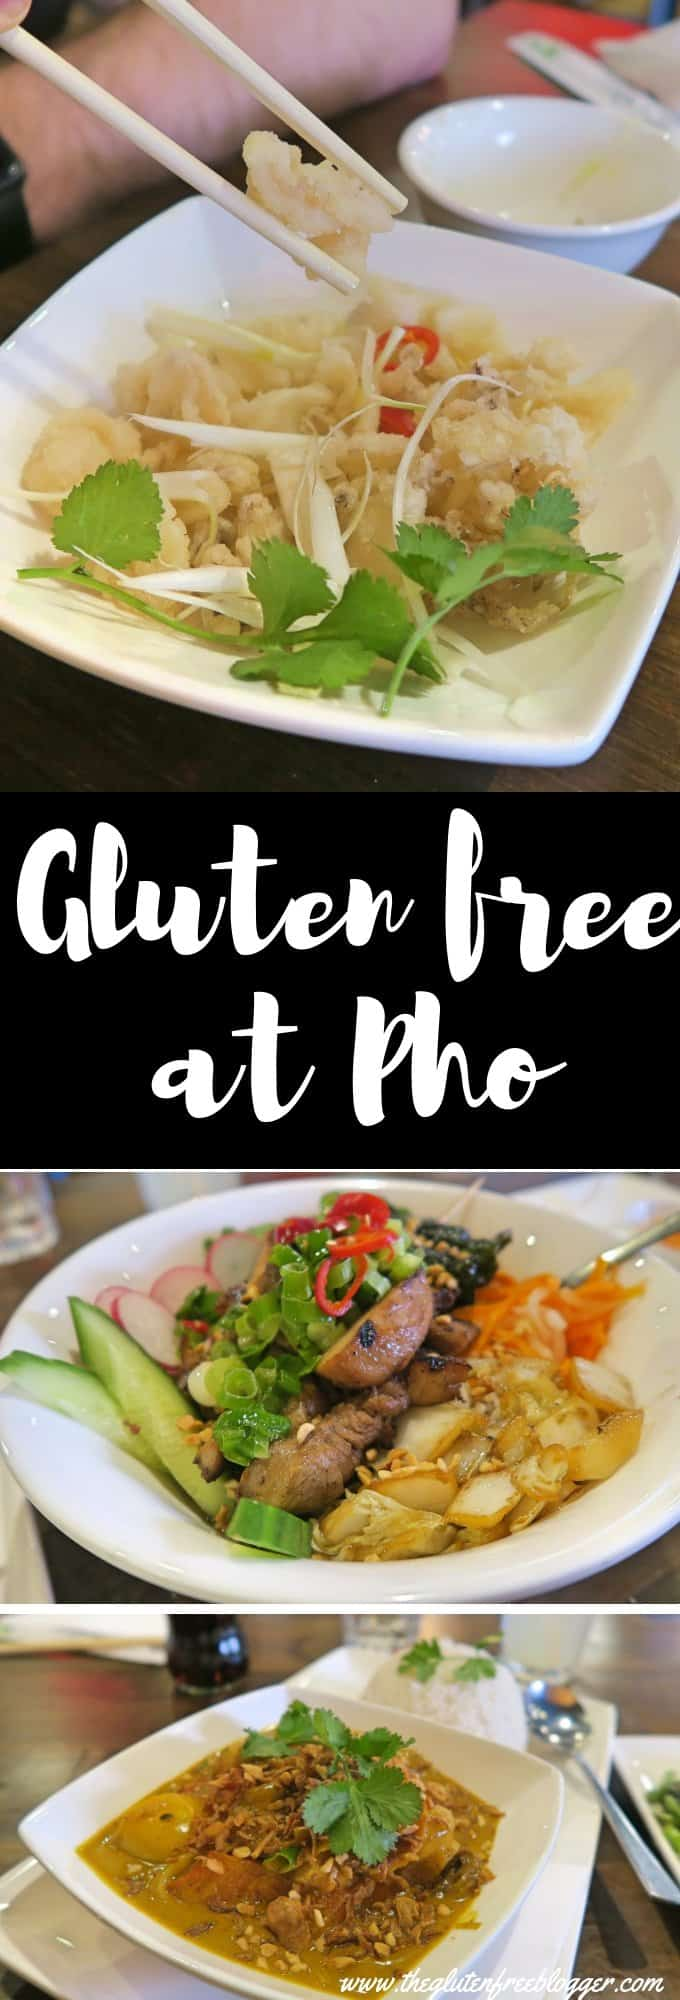 gluten free pho - vietnamese food - coeliac - celiac - coeliac uk - gluten free restaurant